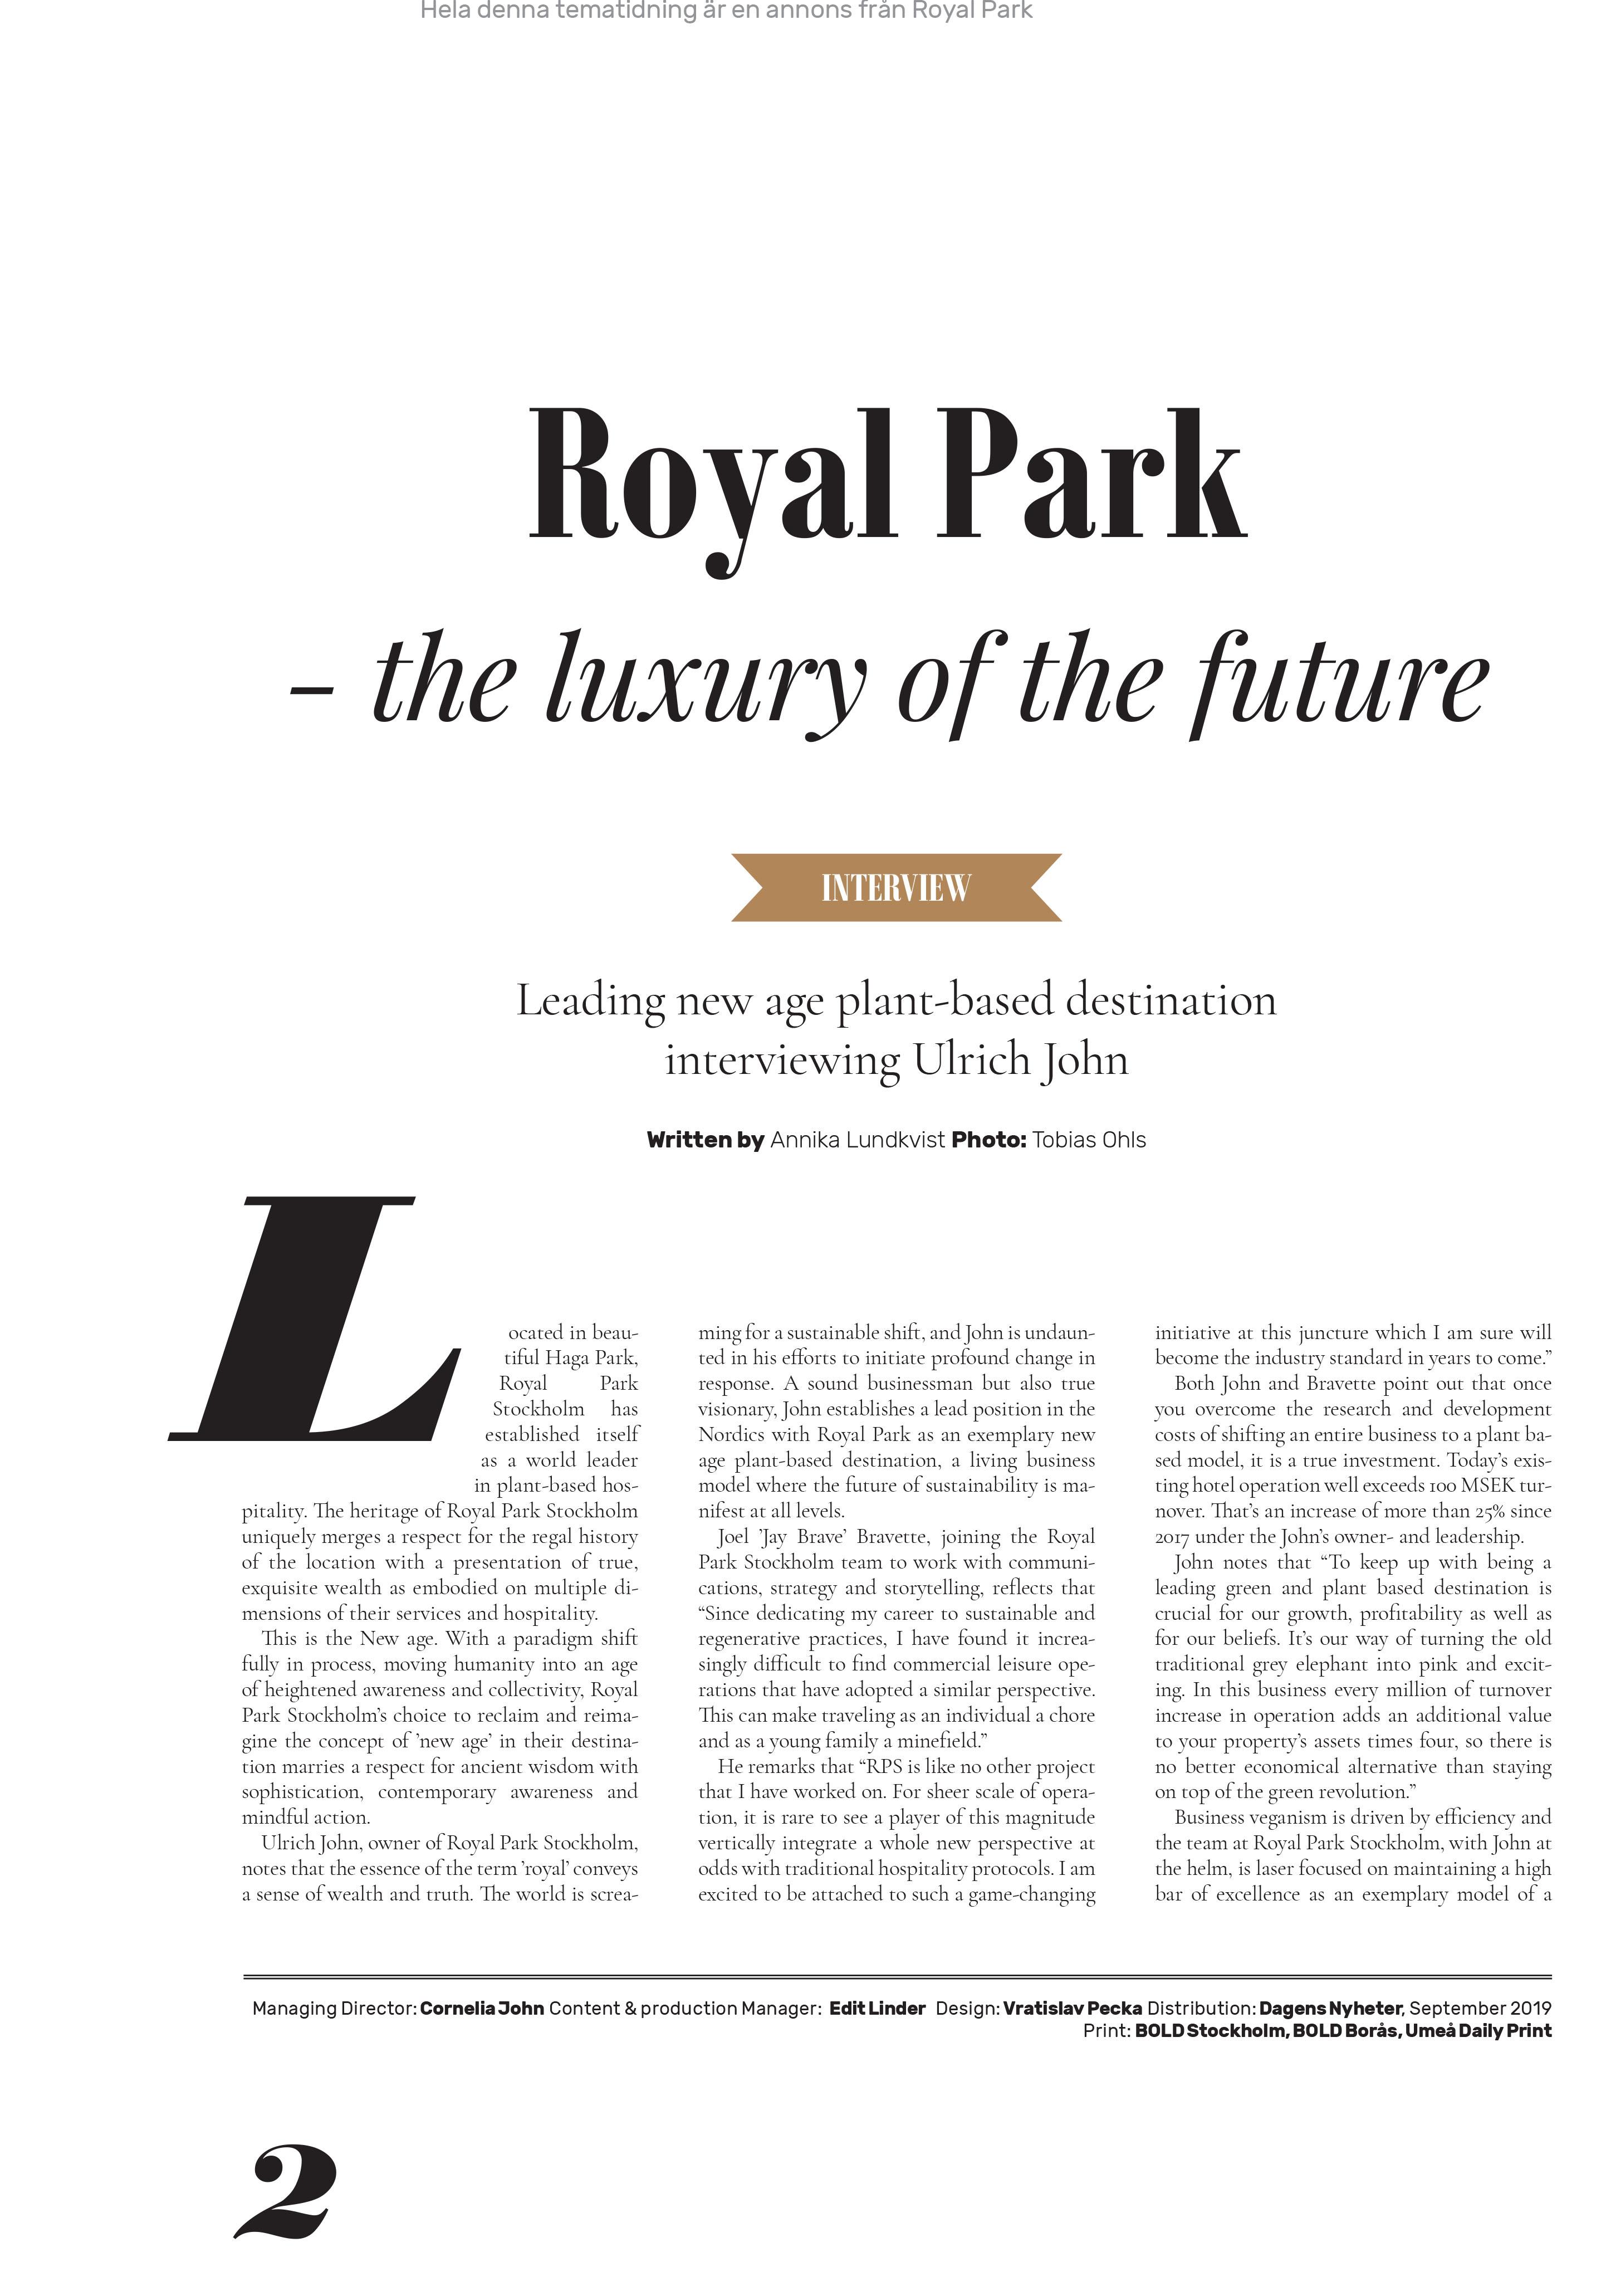 Royal Park Articles in Dagens Nyheter